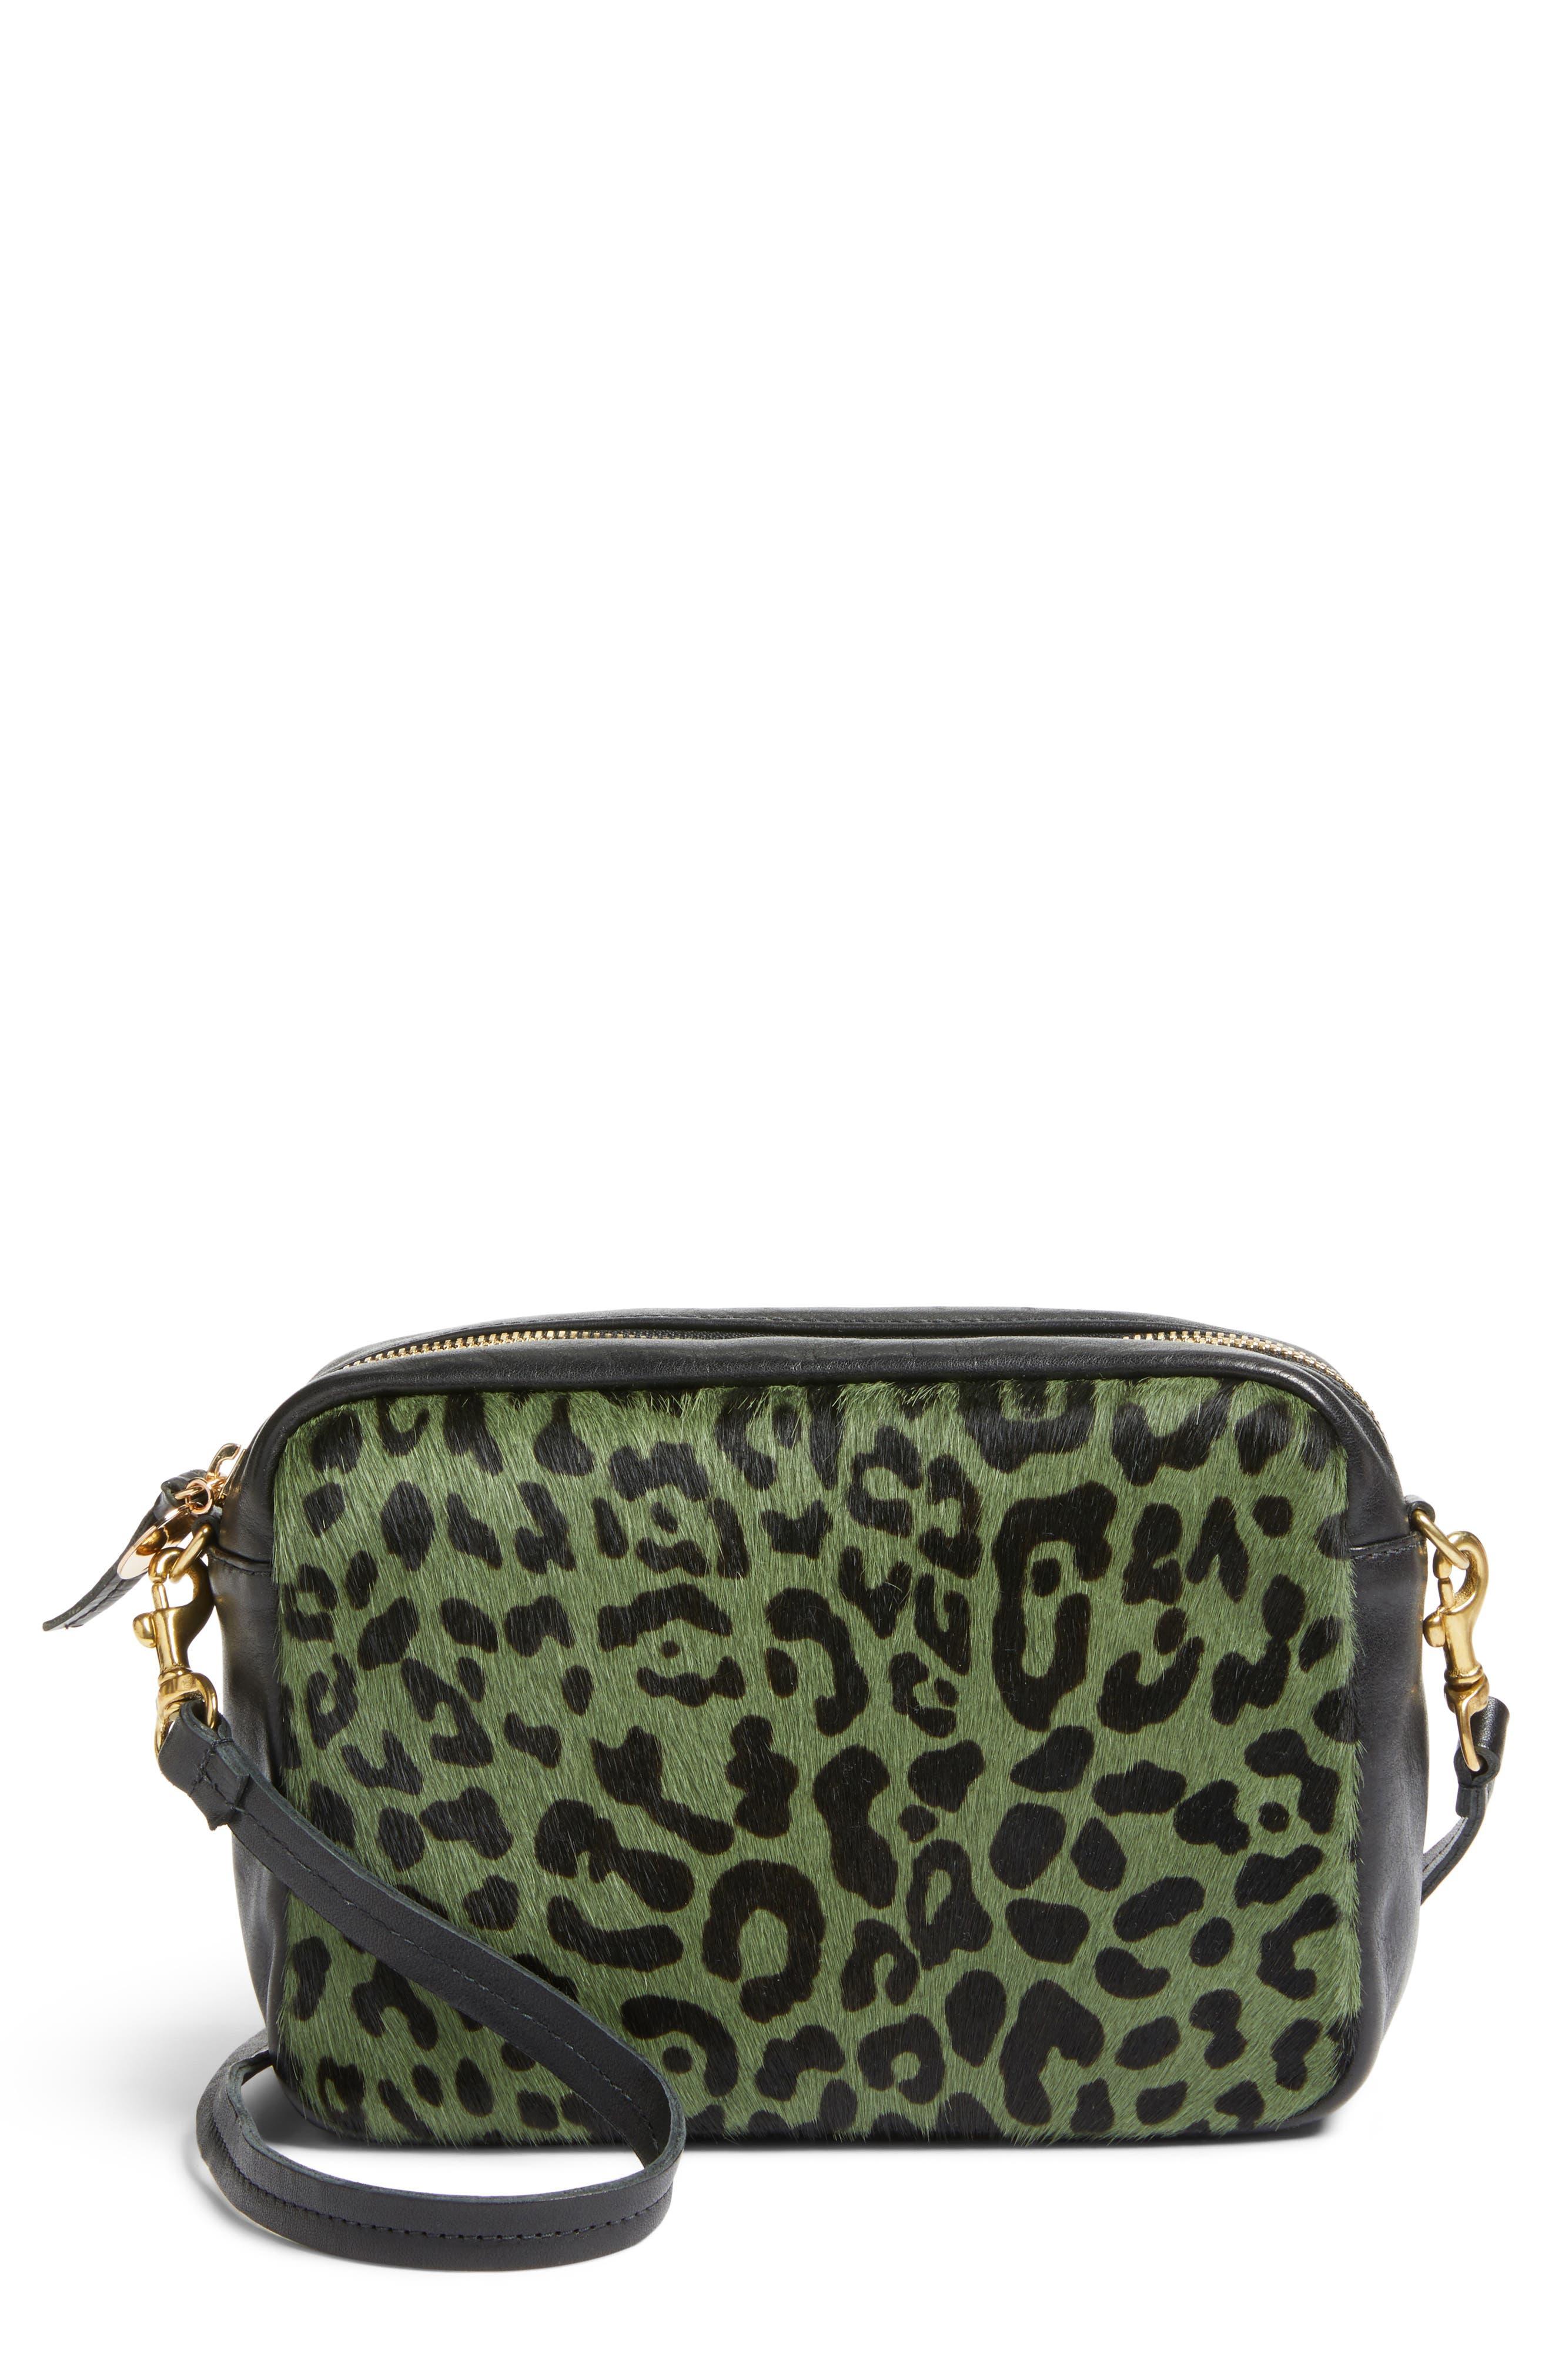 Clare V. Midi Sac Leather & Genuine Calf Hair Shoulder Bag